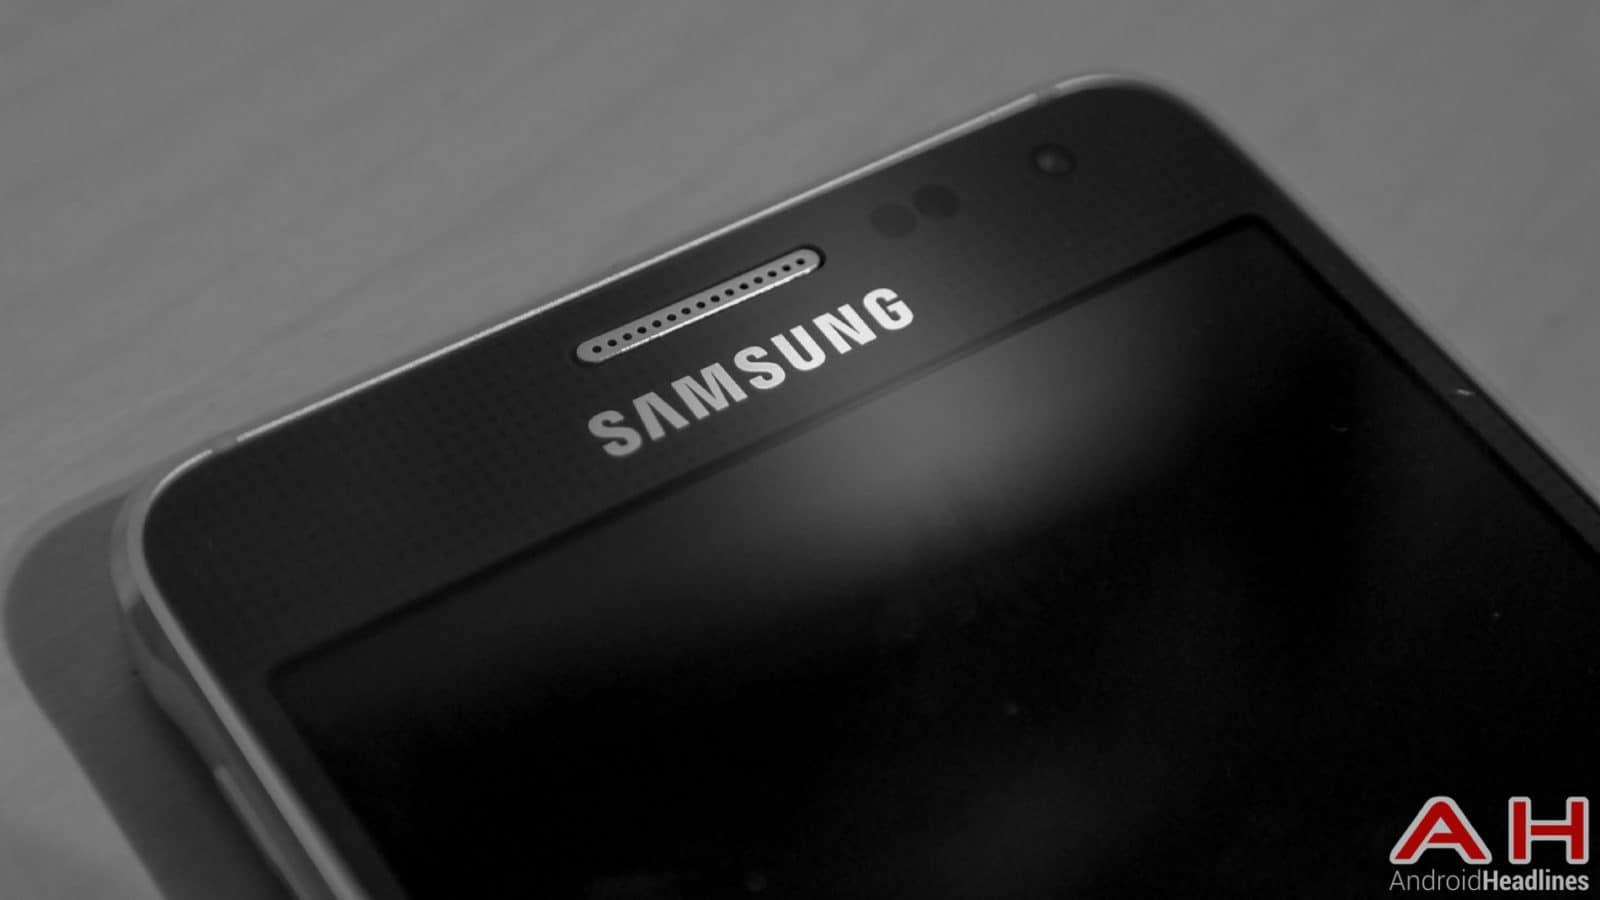 Samsung-Logos-AH-1